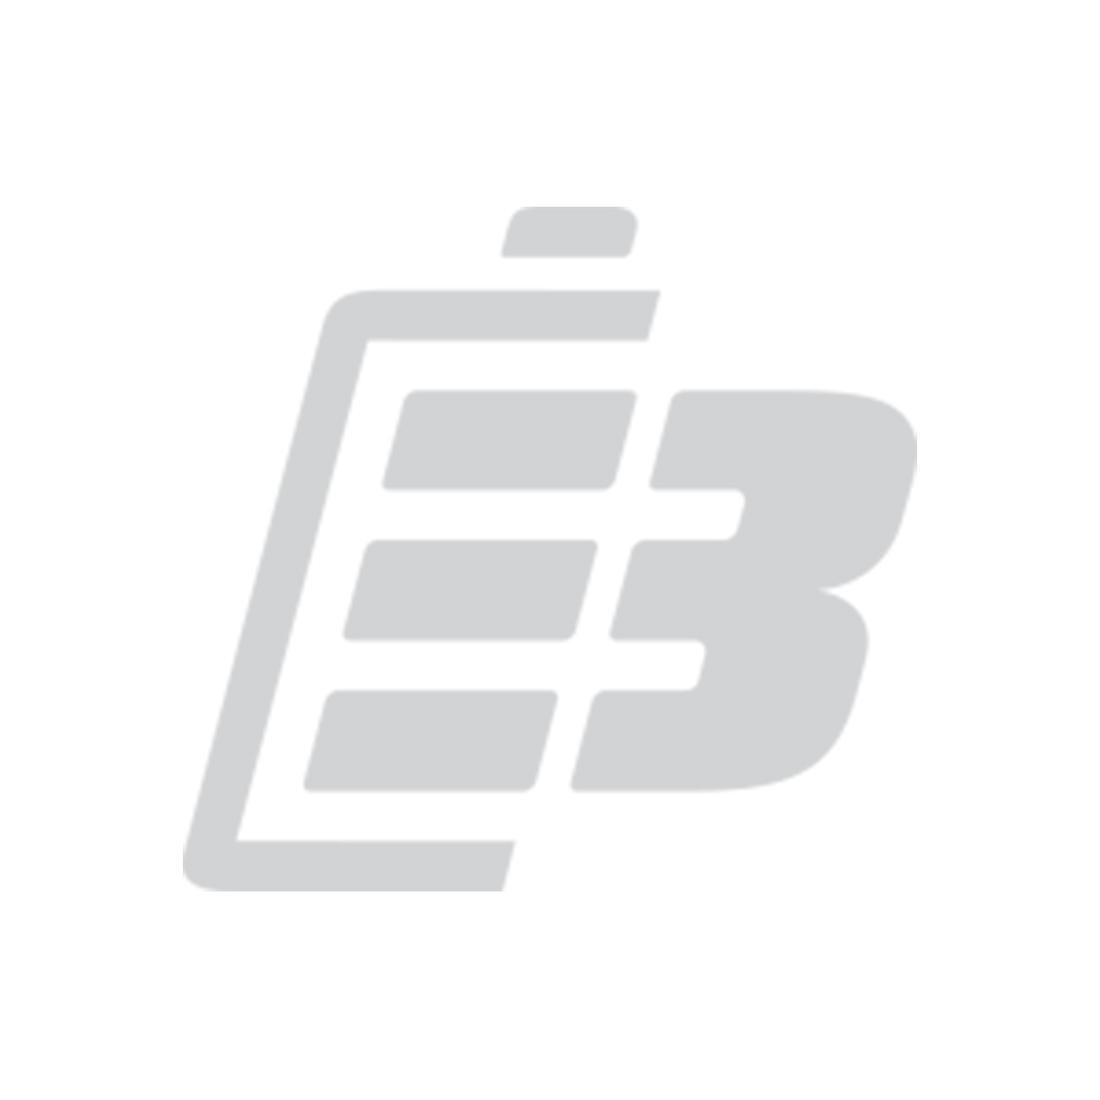 MP3 battery Apple iPod Nano 7th generation_1